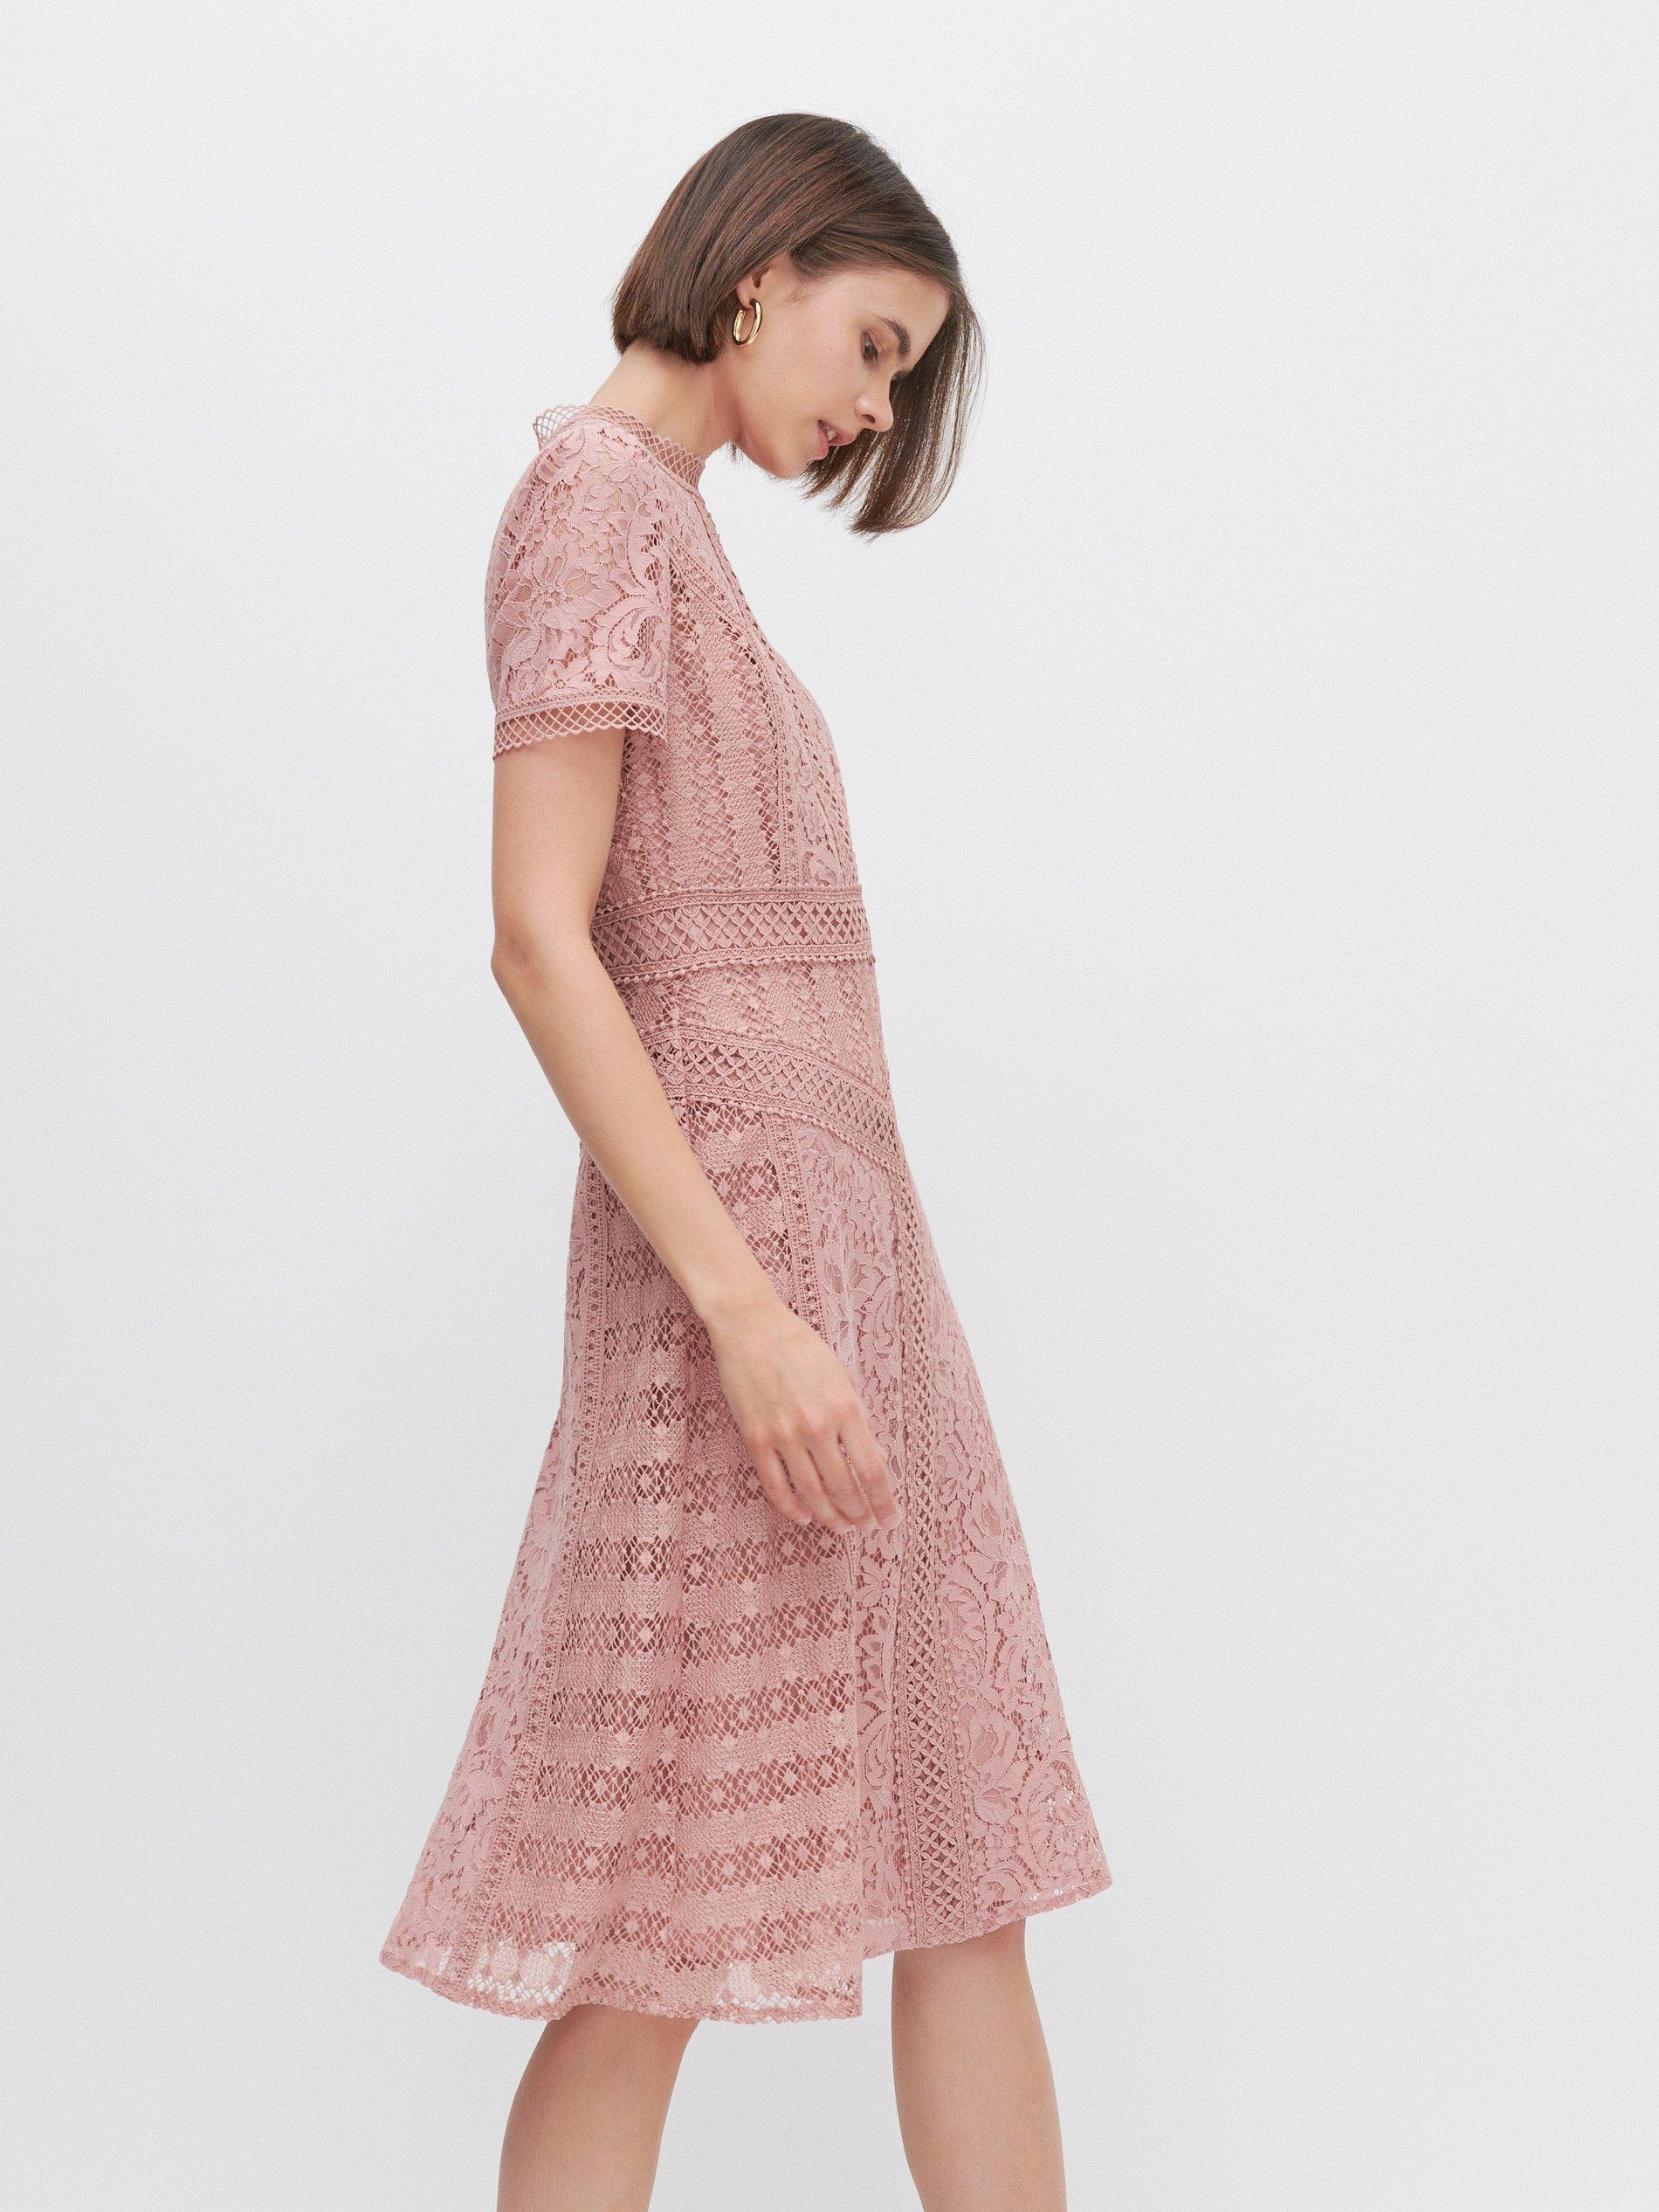 sukienka-koronkowa-na-wesele